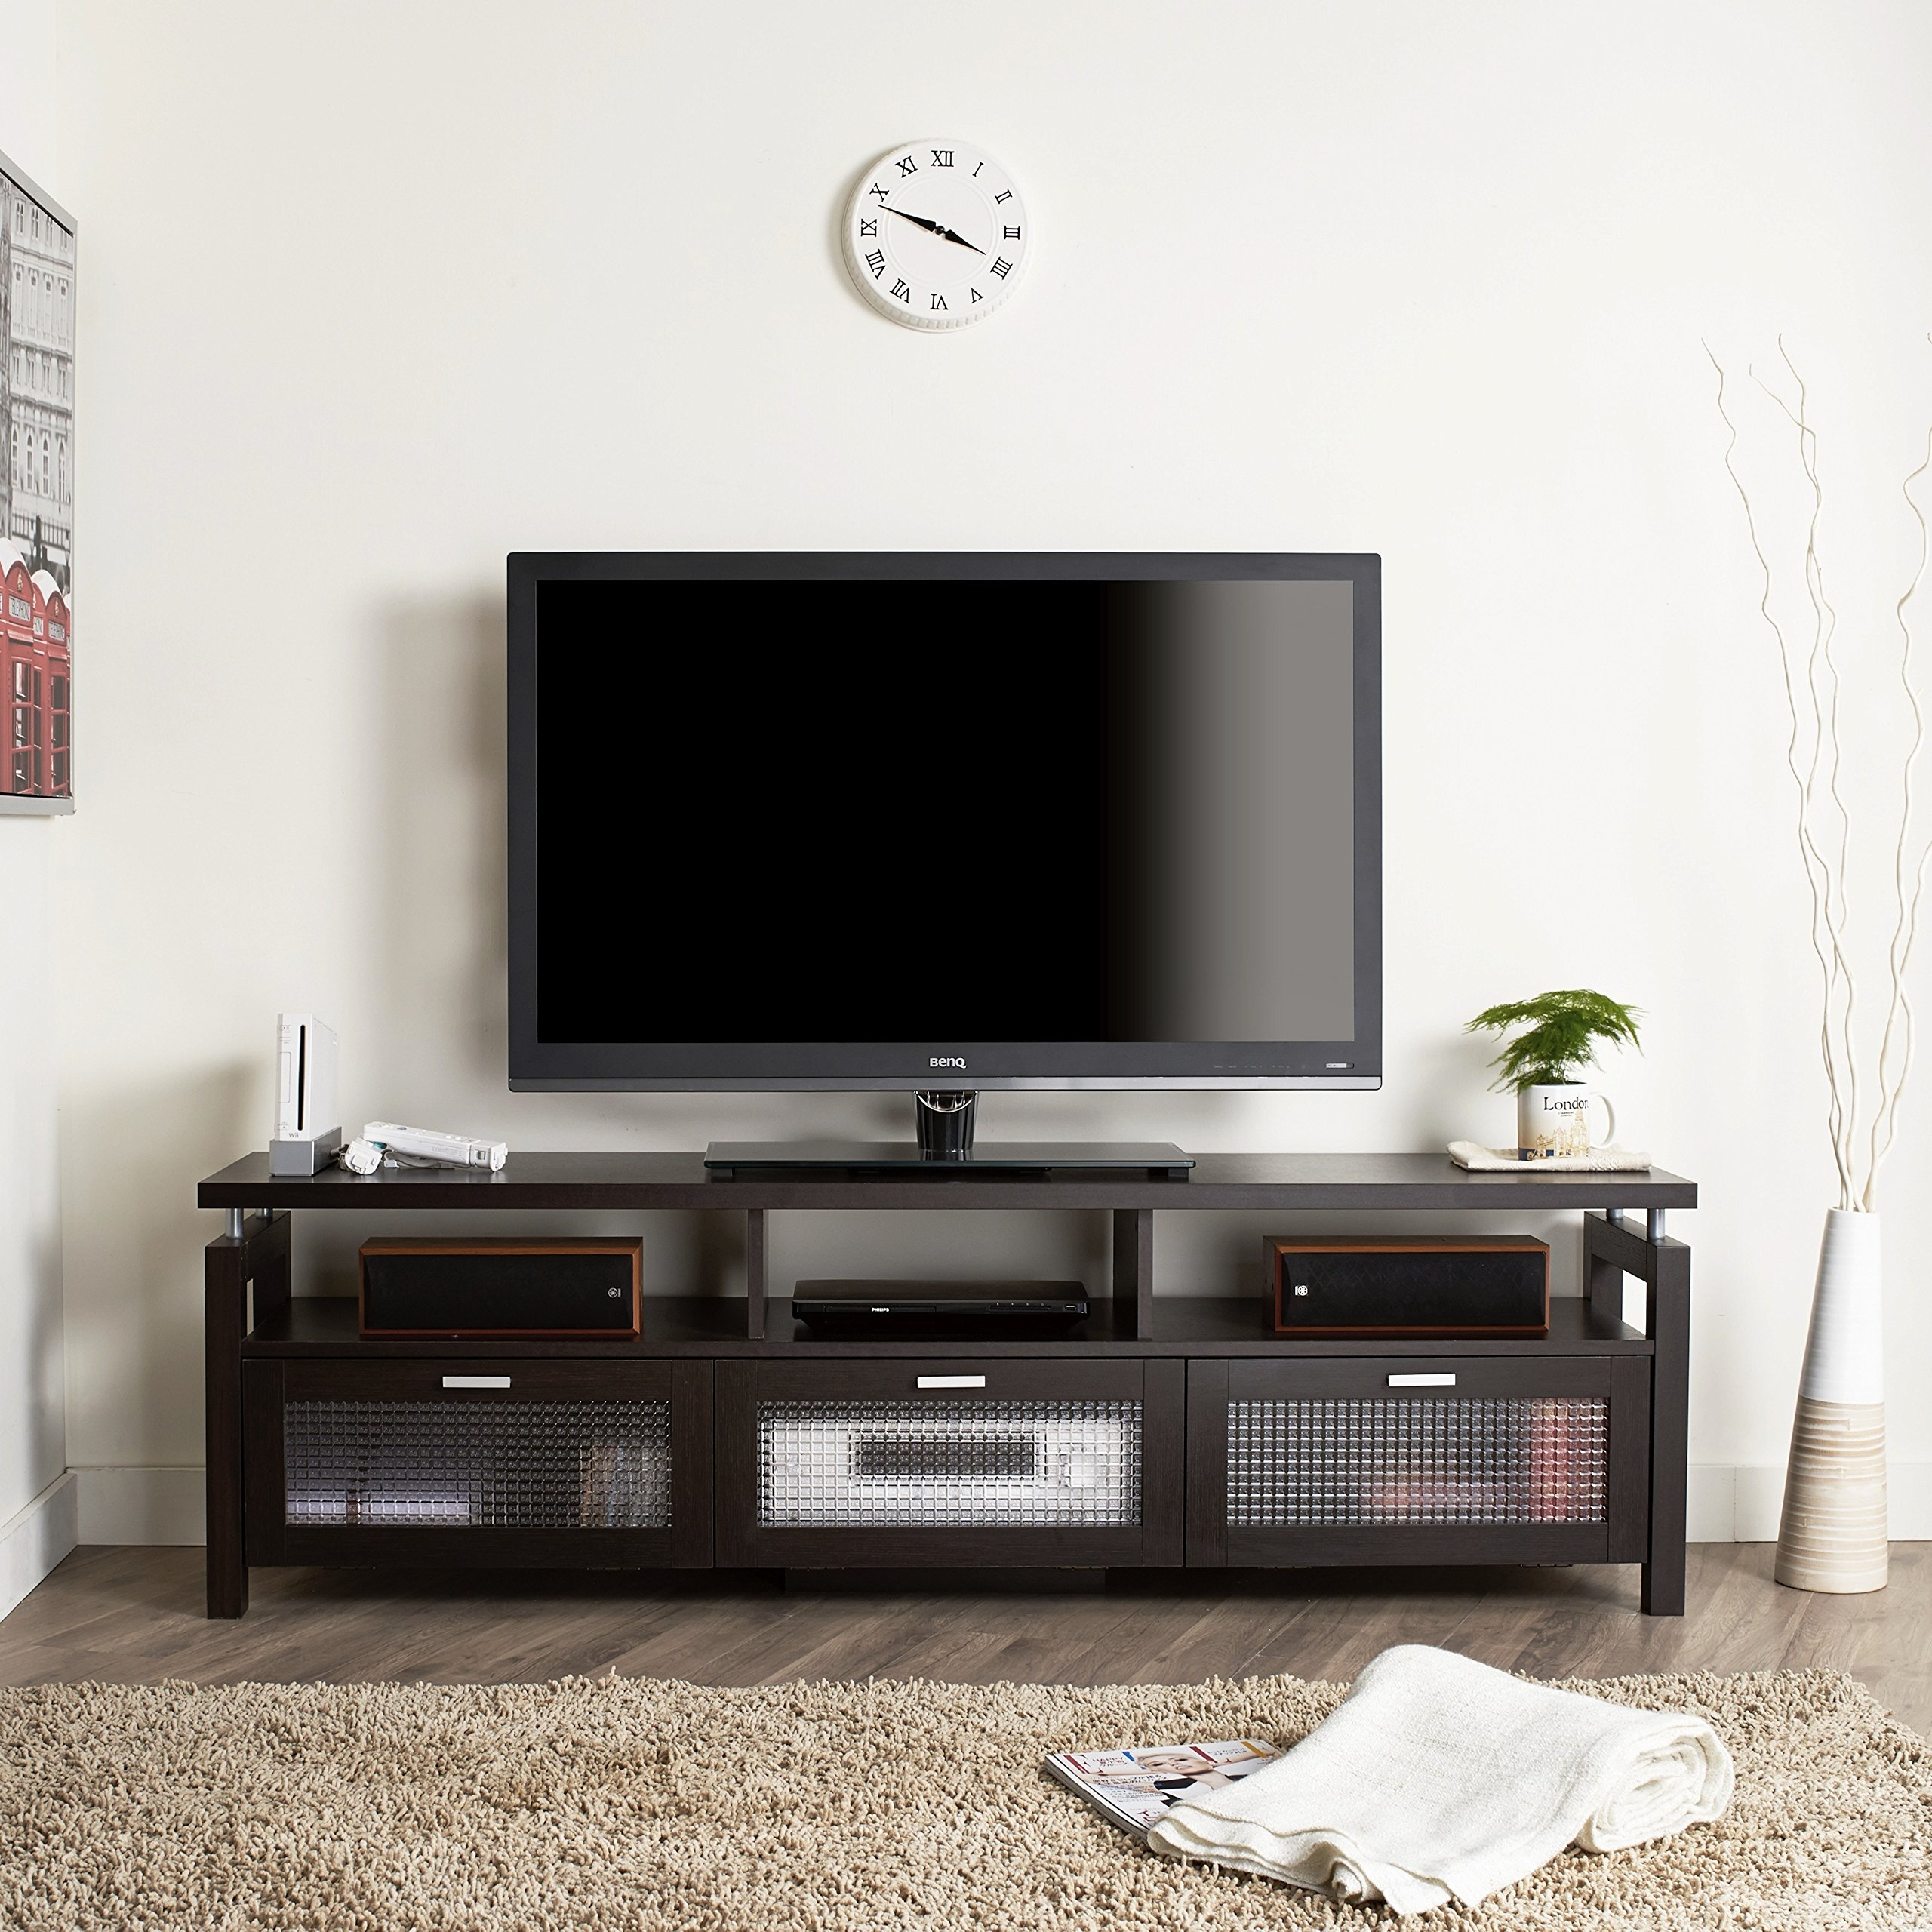 Furniture of America Bauston Espresso Entertainment Console/Contemporary Tv Stand by Furniture of America